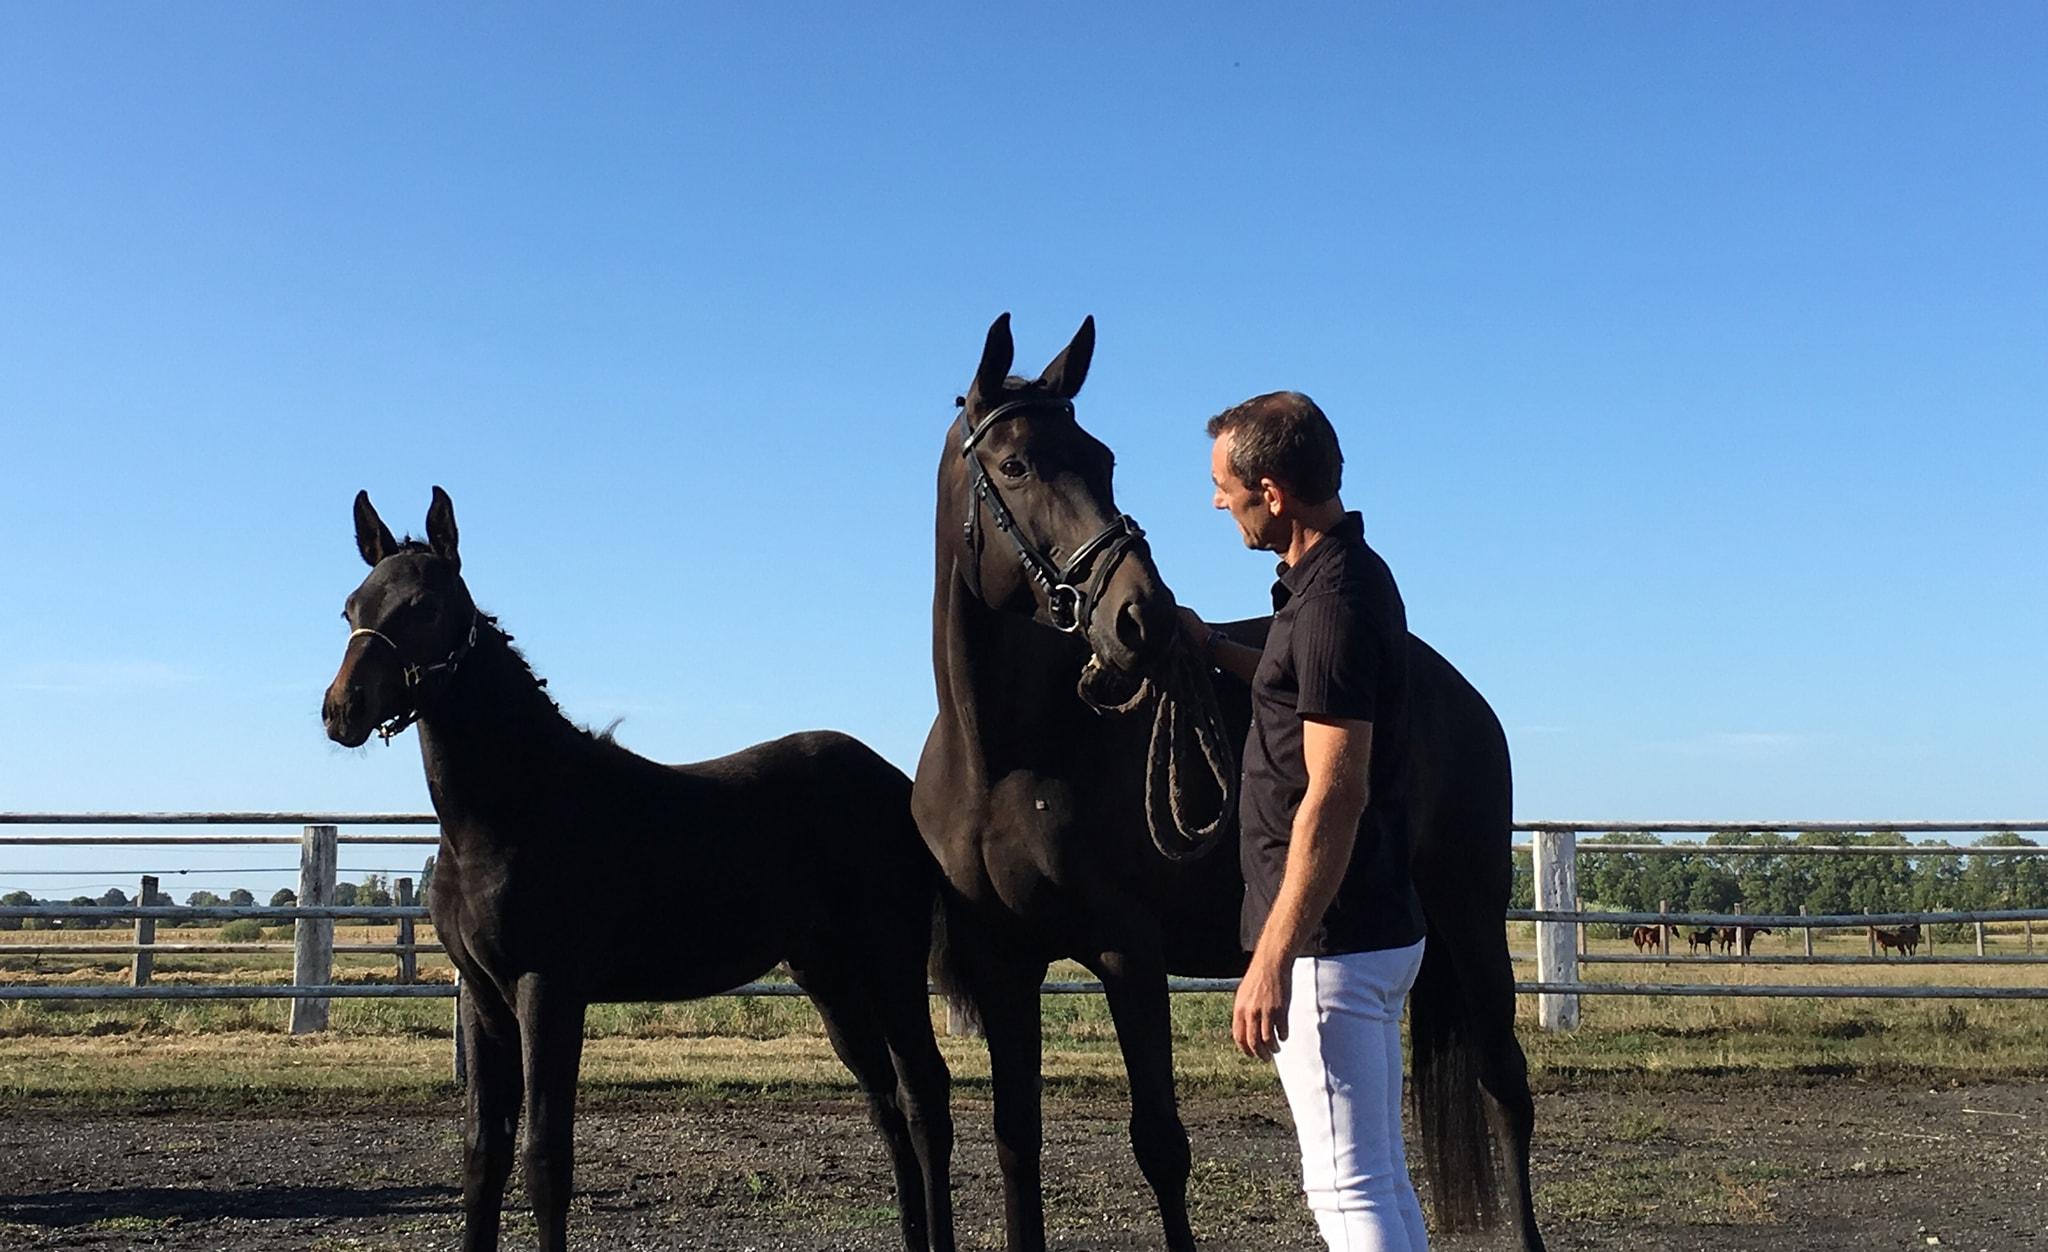 cedrick concours foal.jpg